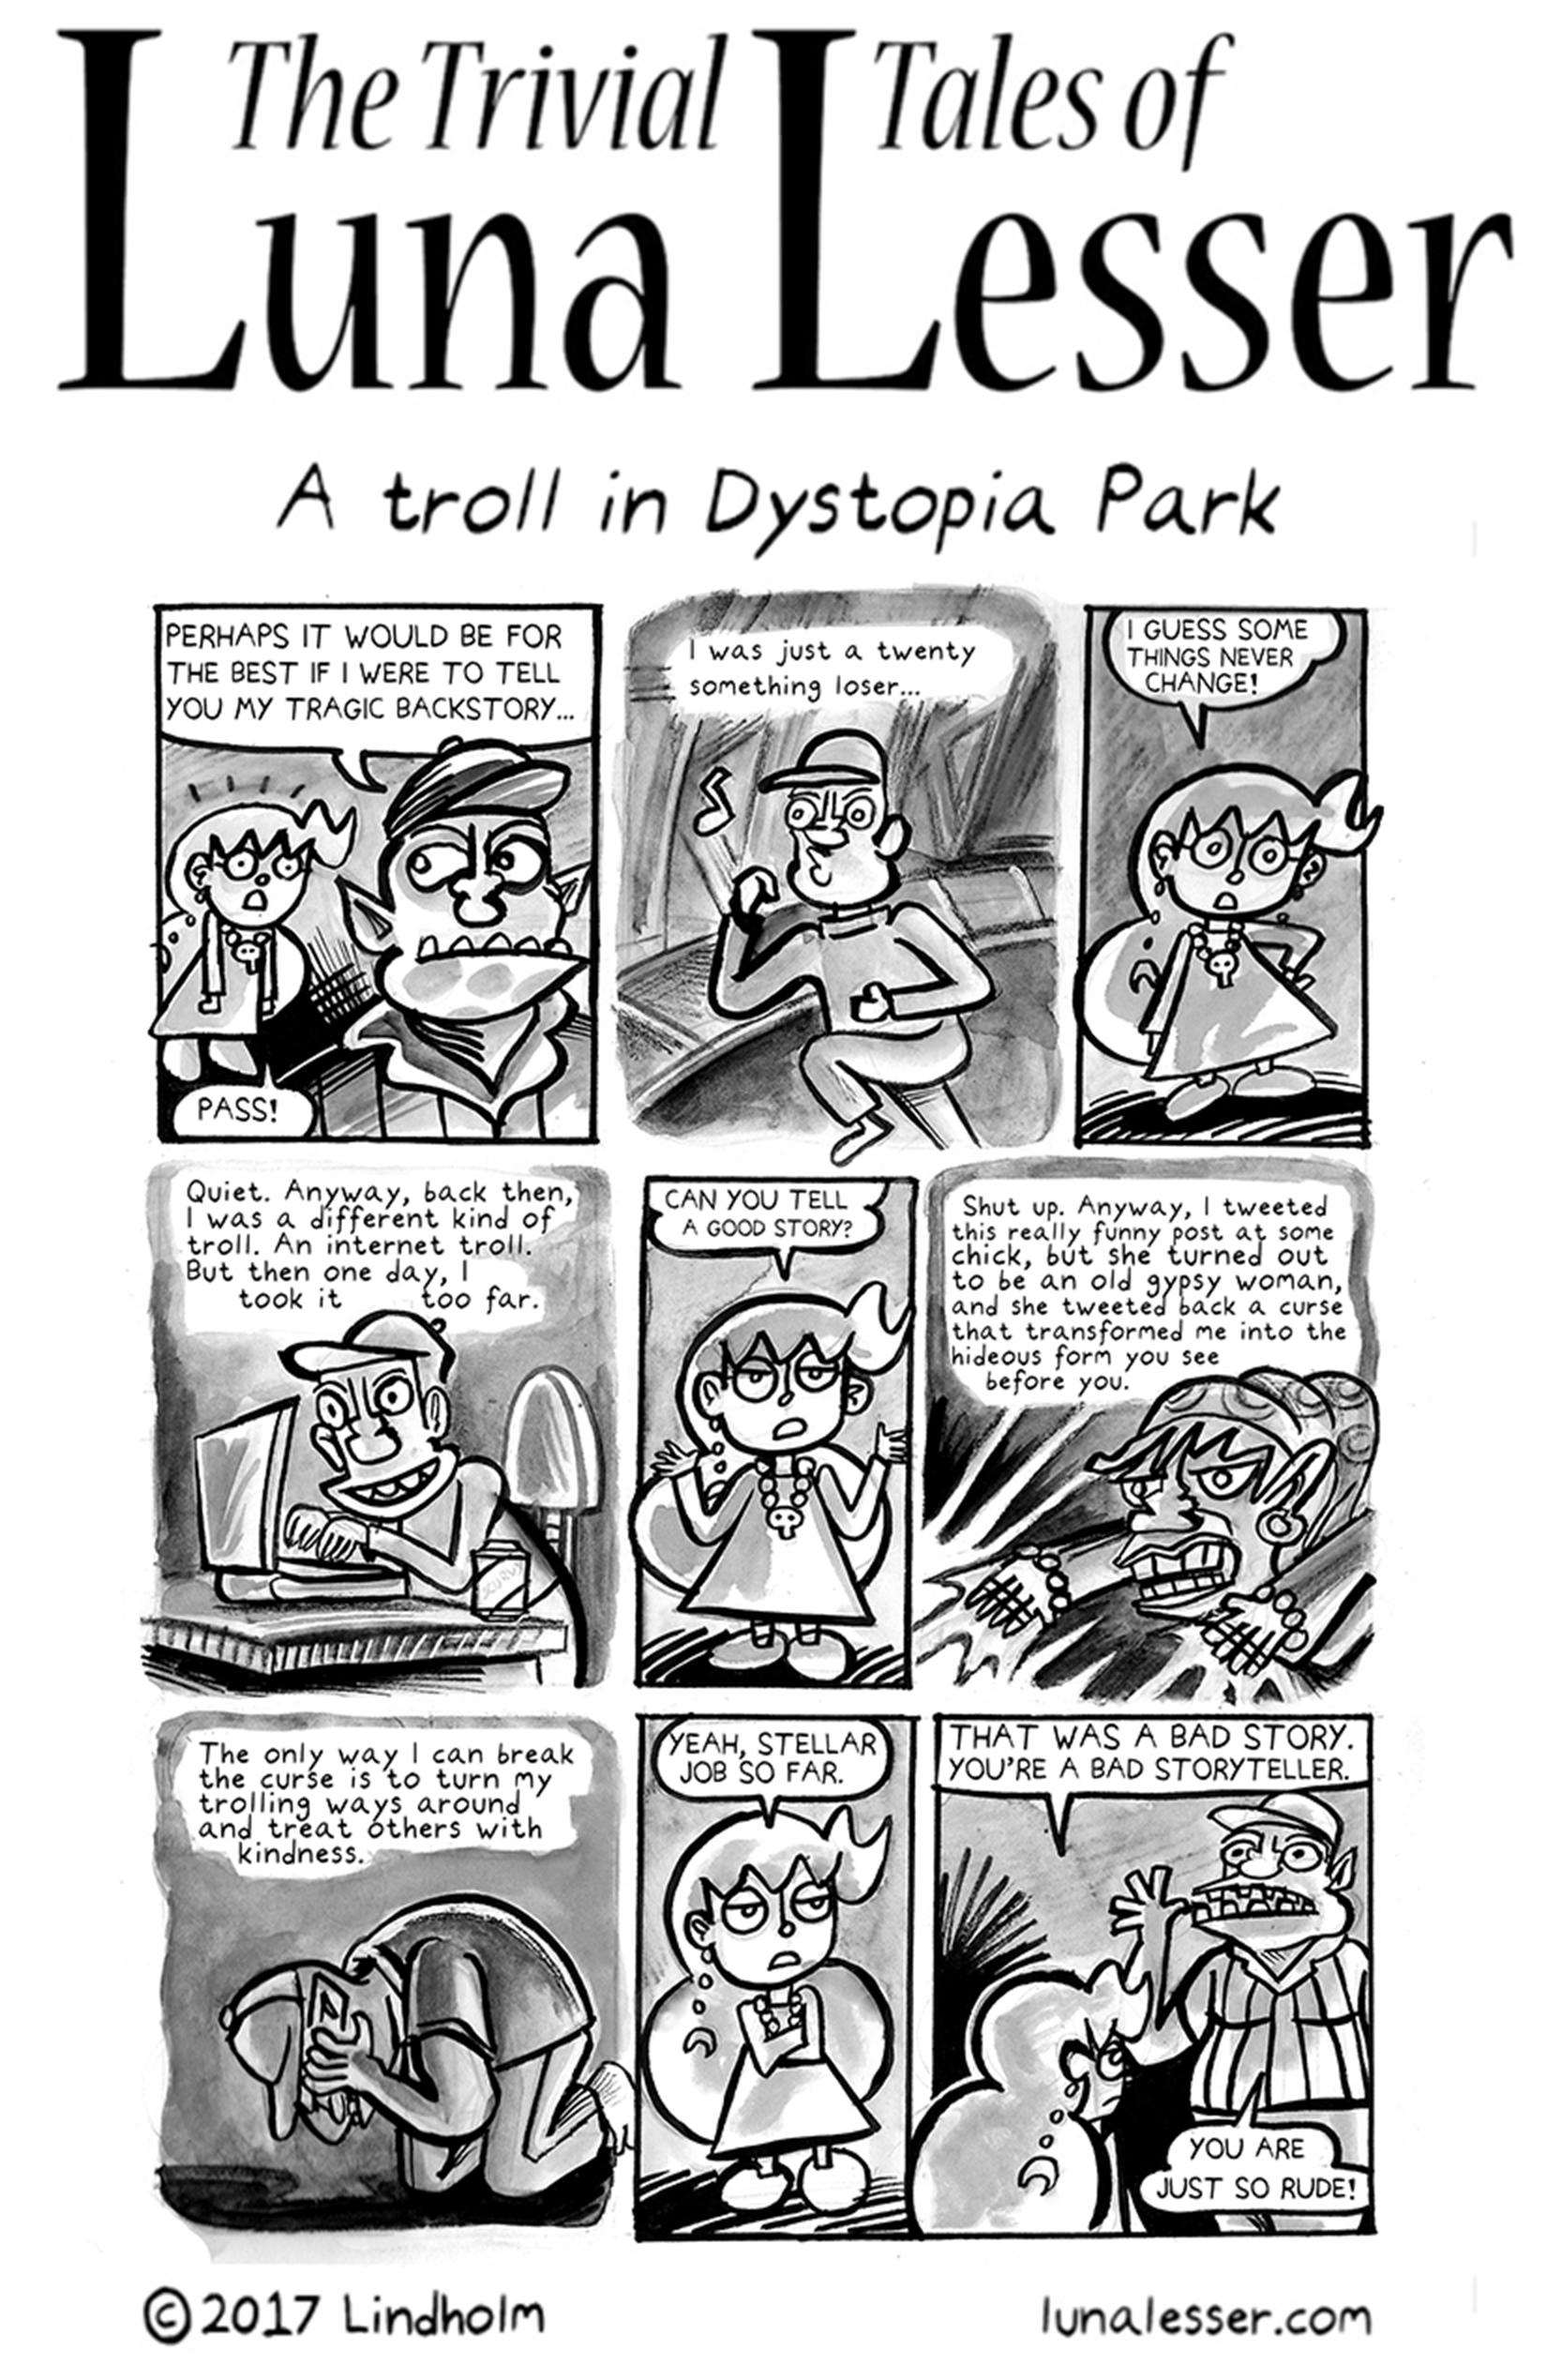 A troll in Dystopia Park (3/8)